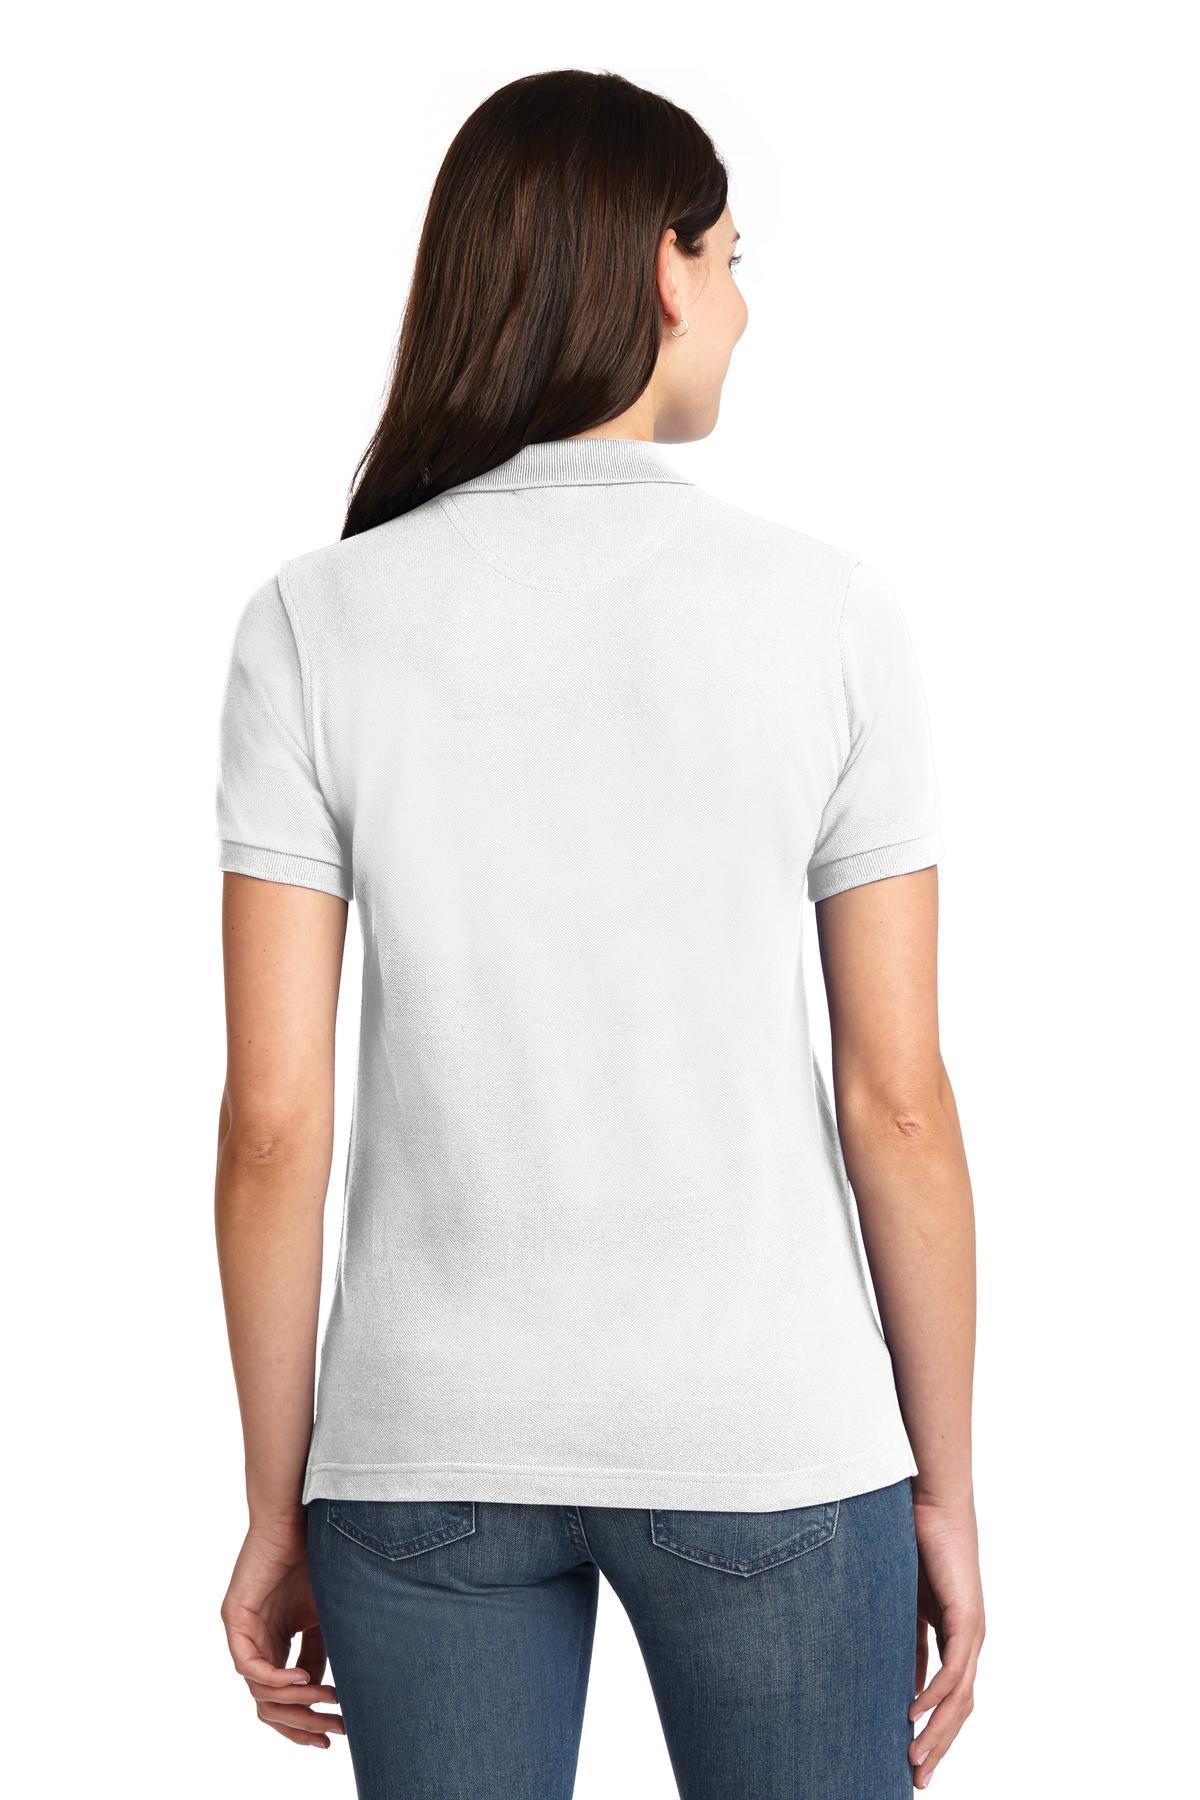 Ladies Pique Polo Shirt - WCL2230